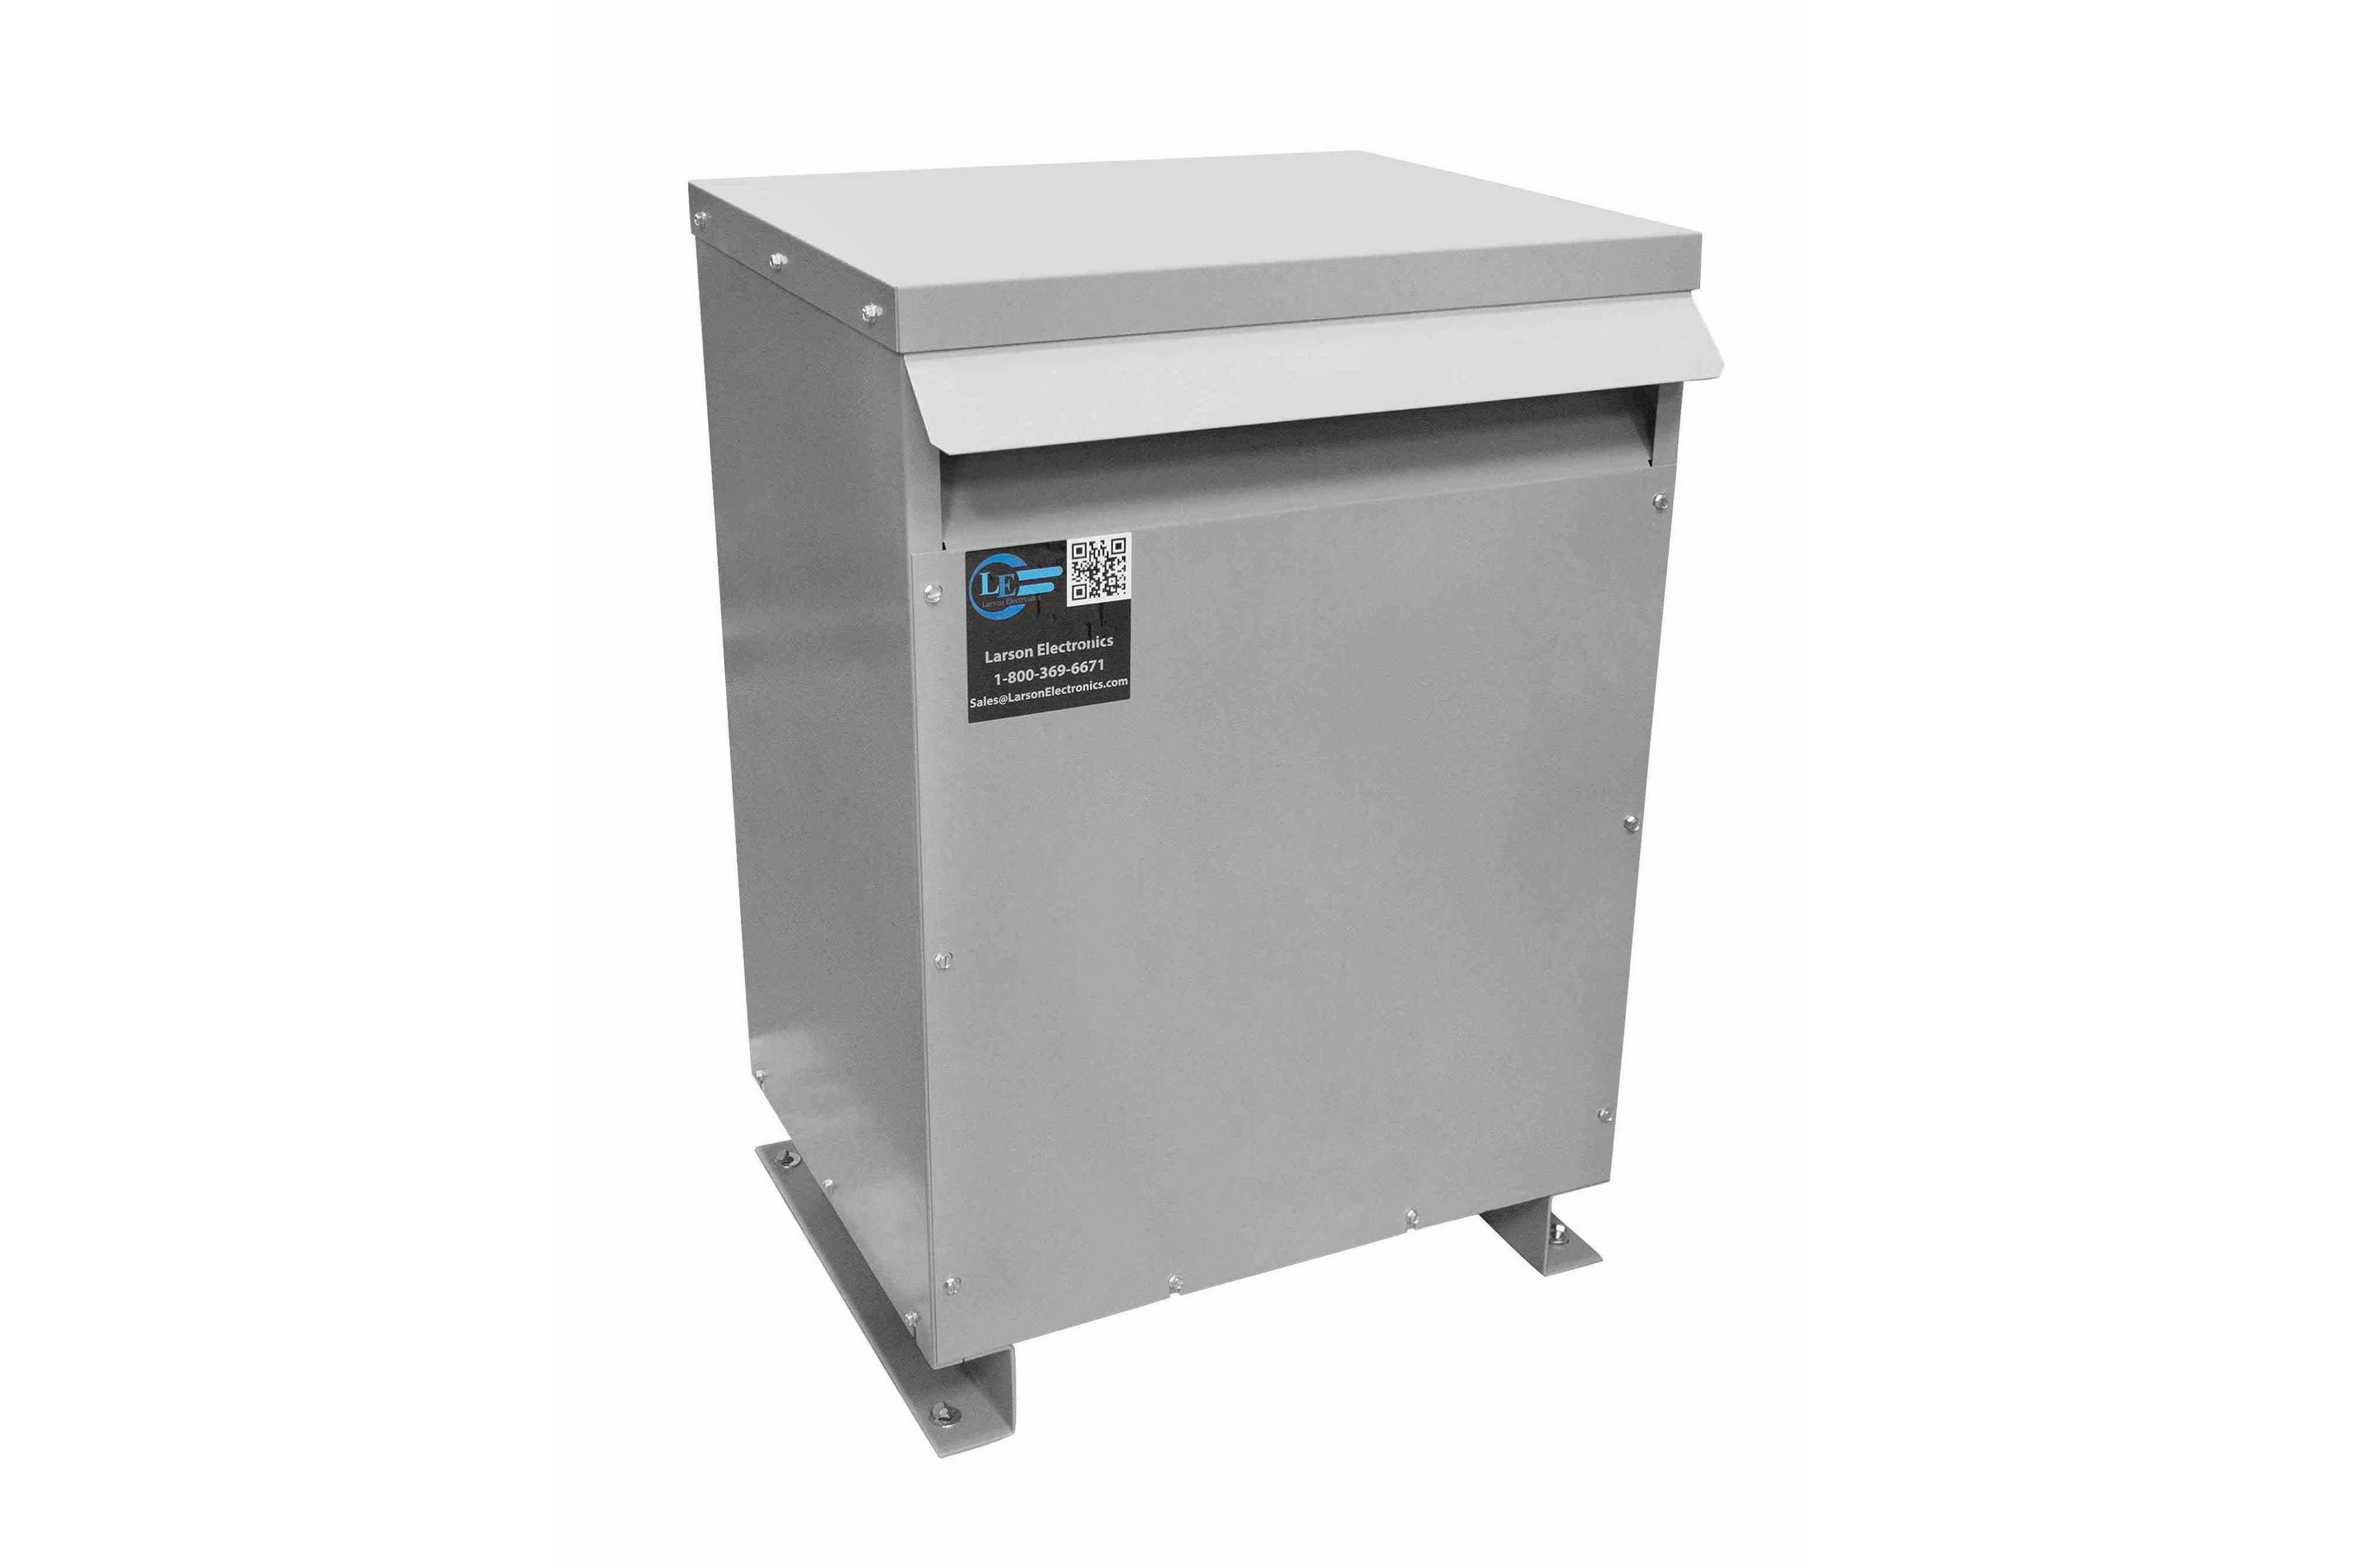 28 kVA 3PH Isolation Transformer, 400V Wye Primary, 240V/120 Delta Secondary, N3R, Ventilated, 60 Hz